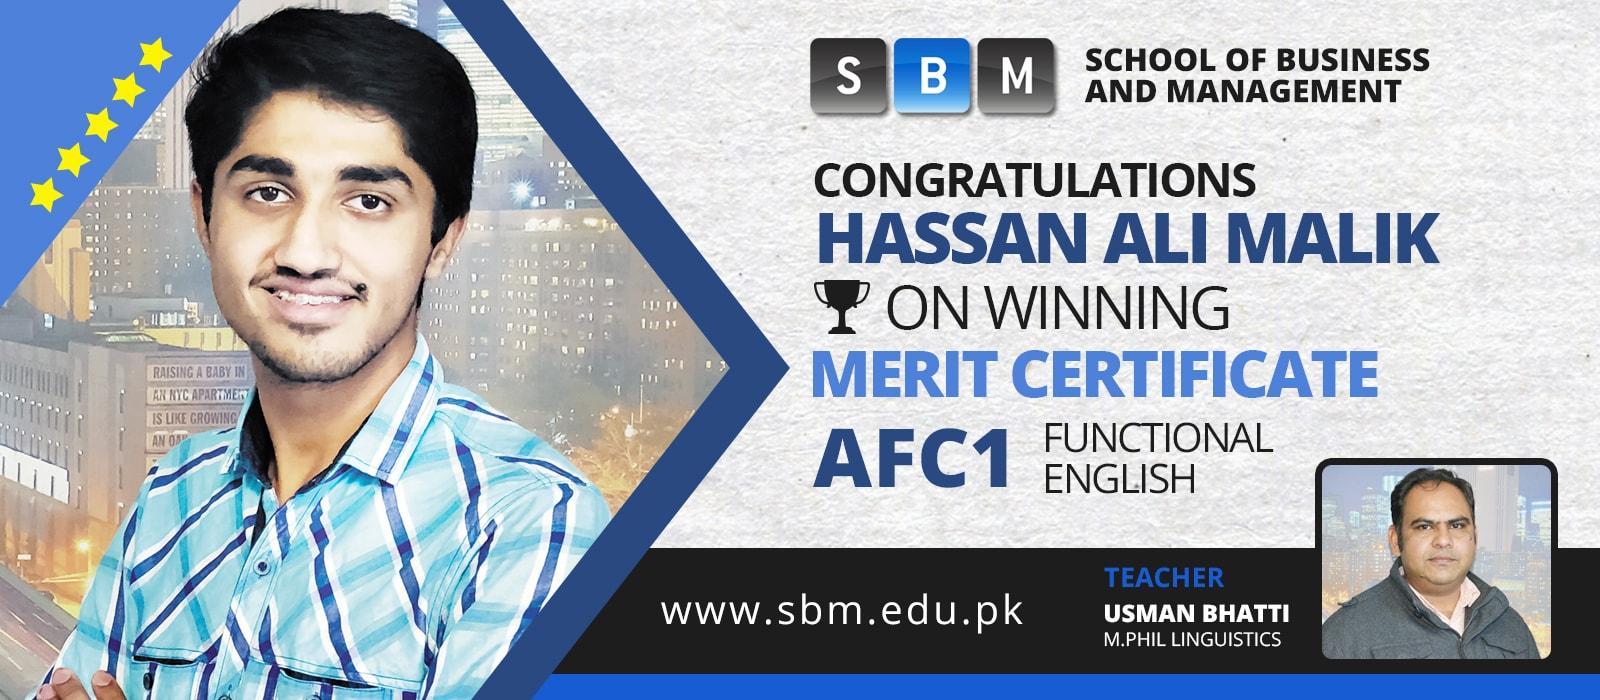 SBM's Student, Hassan Ali Malik, Wins Merit Certificate